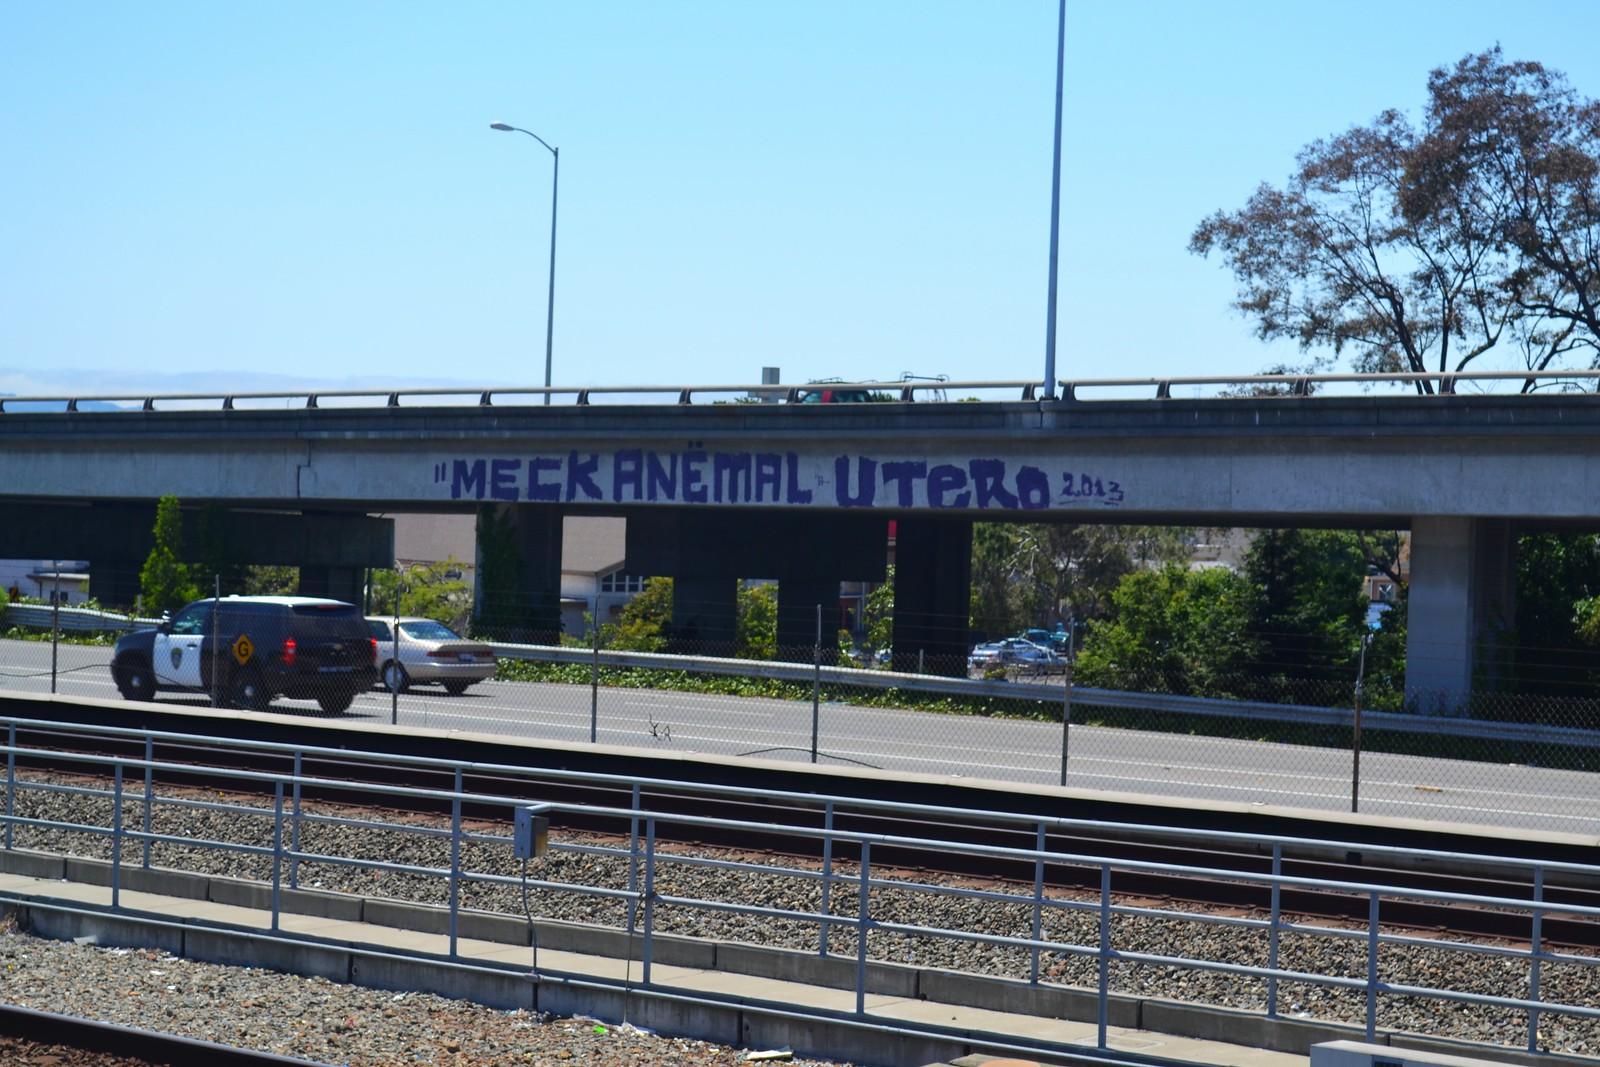 MECK, ANEMAL, UTER, PI, Graffiti, BartShot, Freeway shot, Oakland, Charles